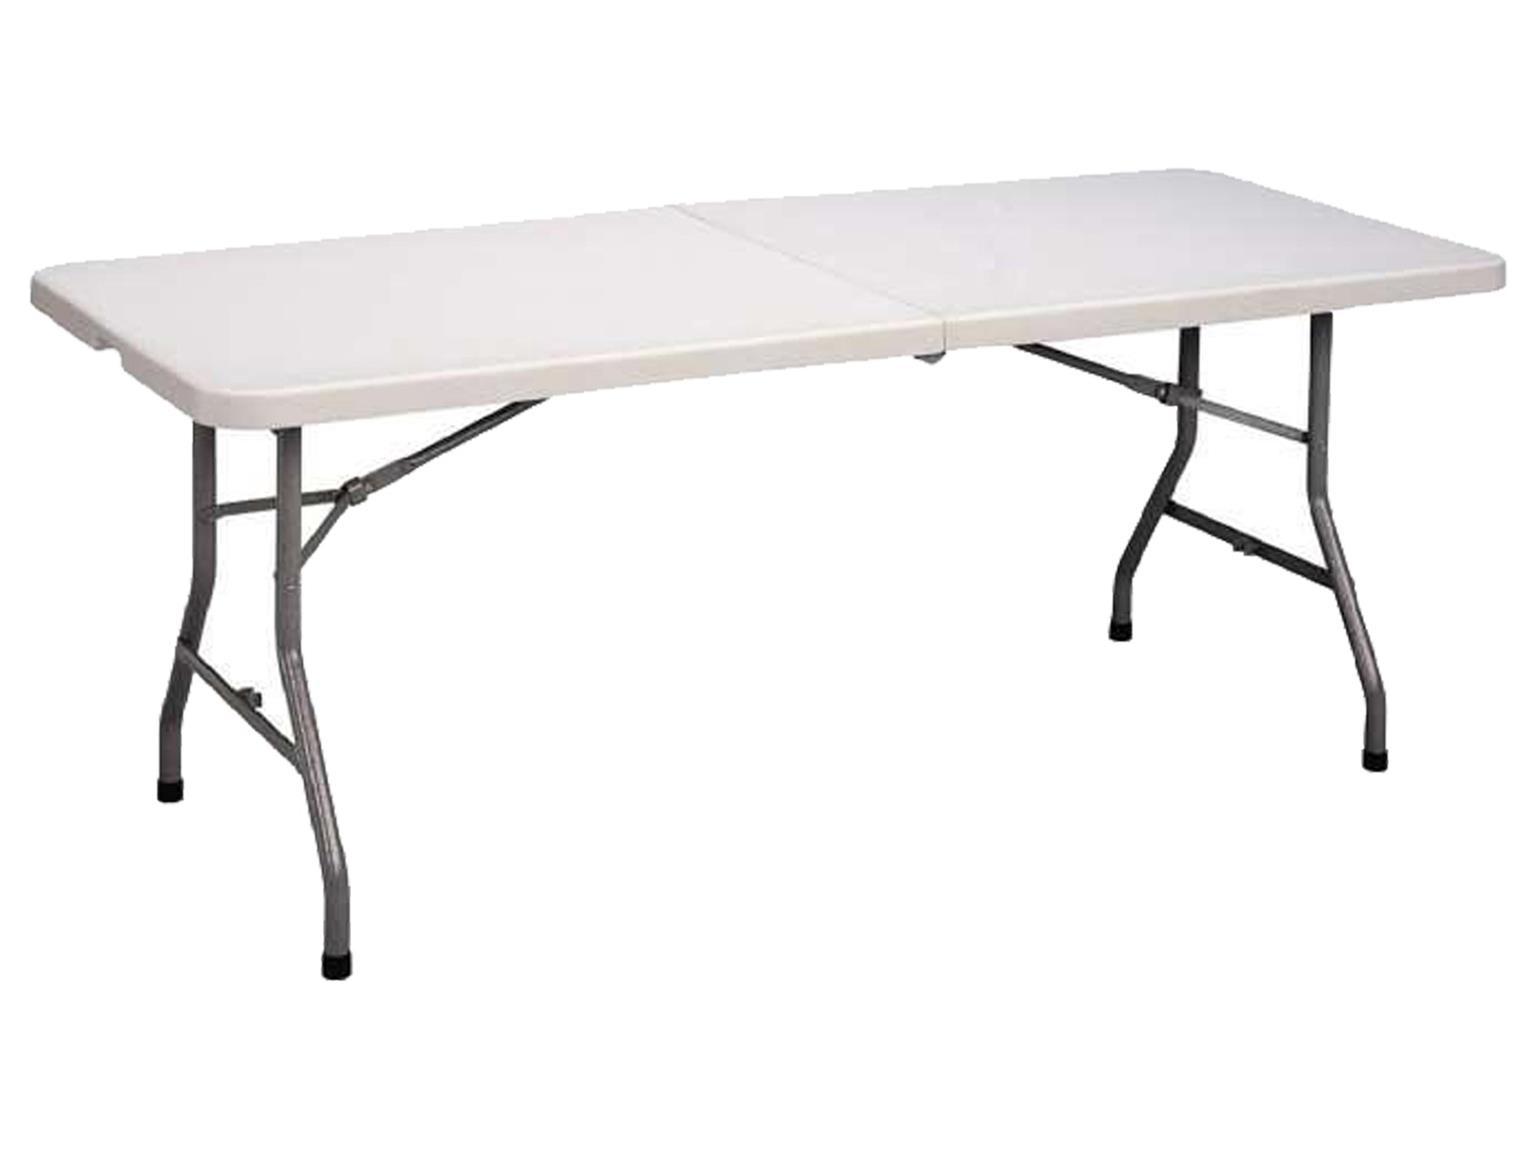 1.8M Folding Trestle Table